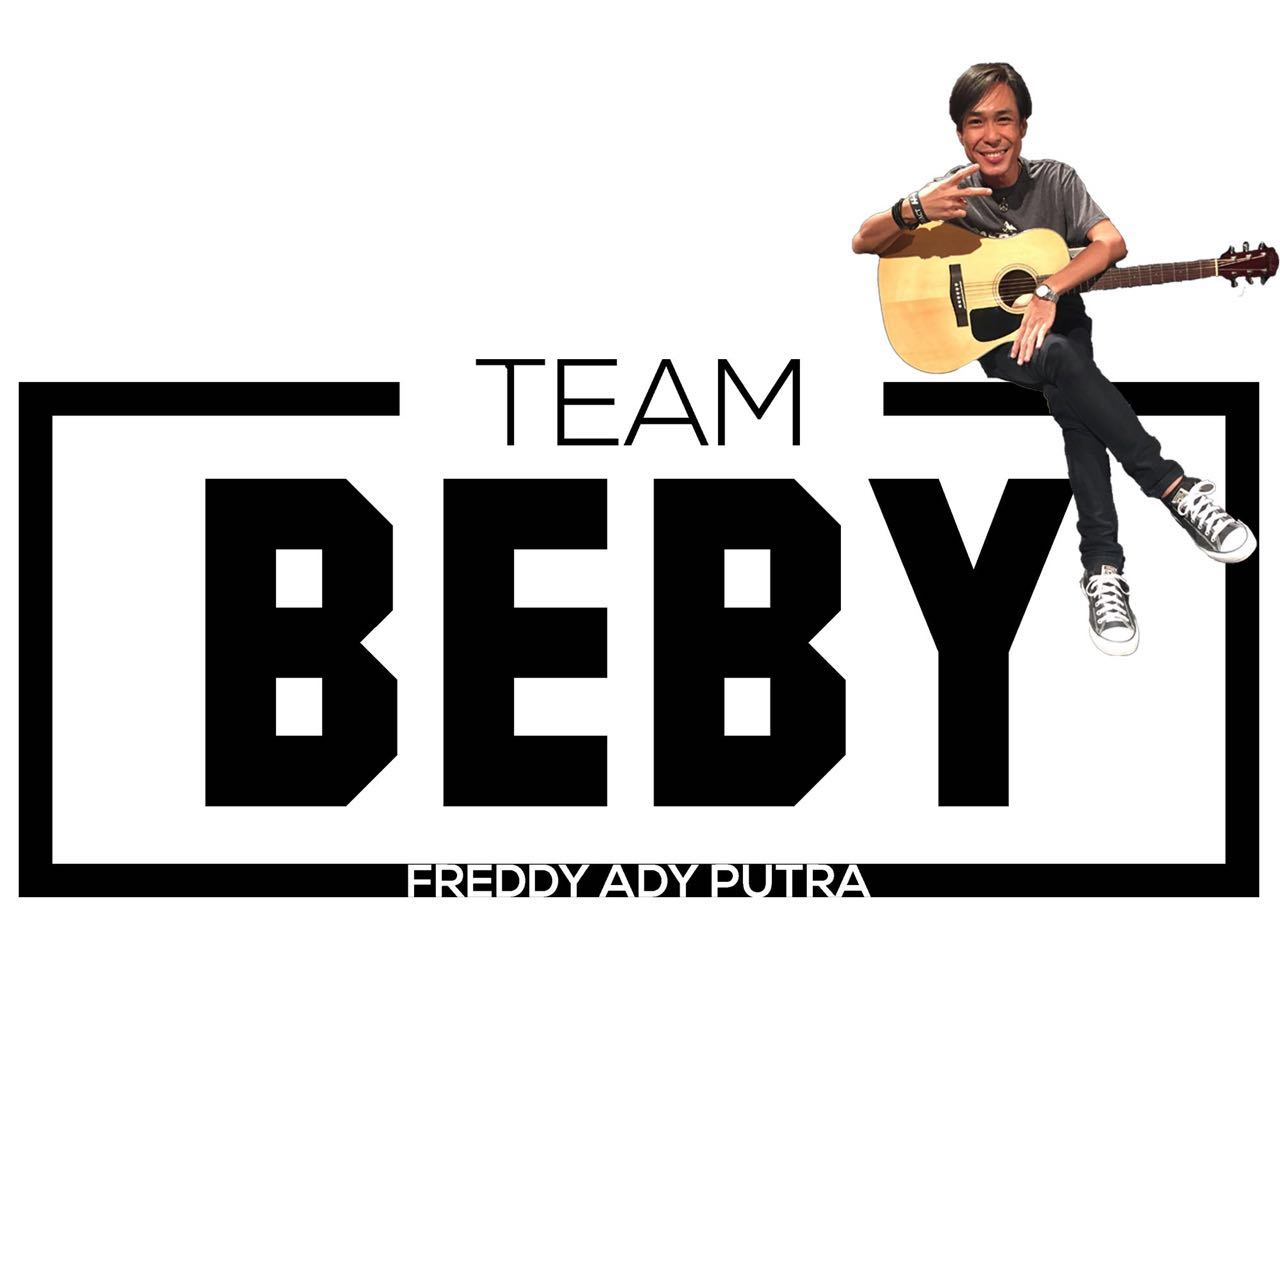 ♥♥ TEAM BEBY ♥♥